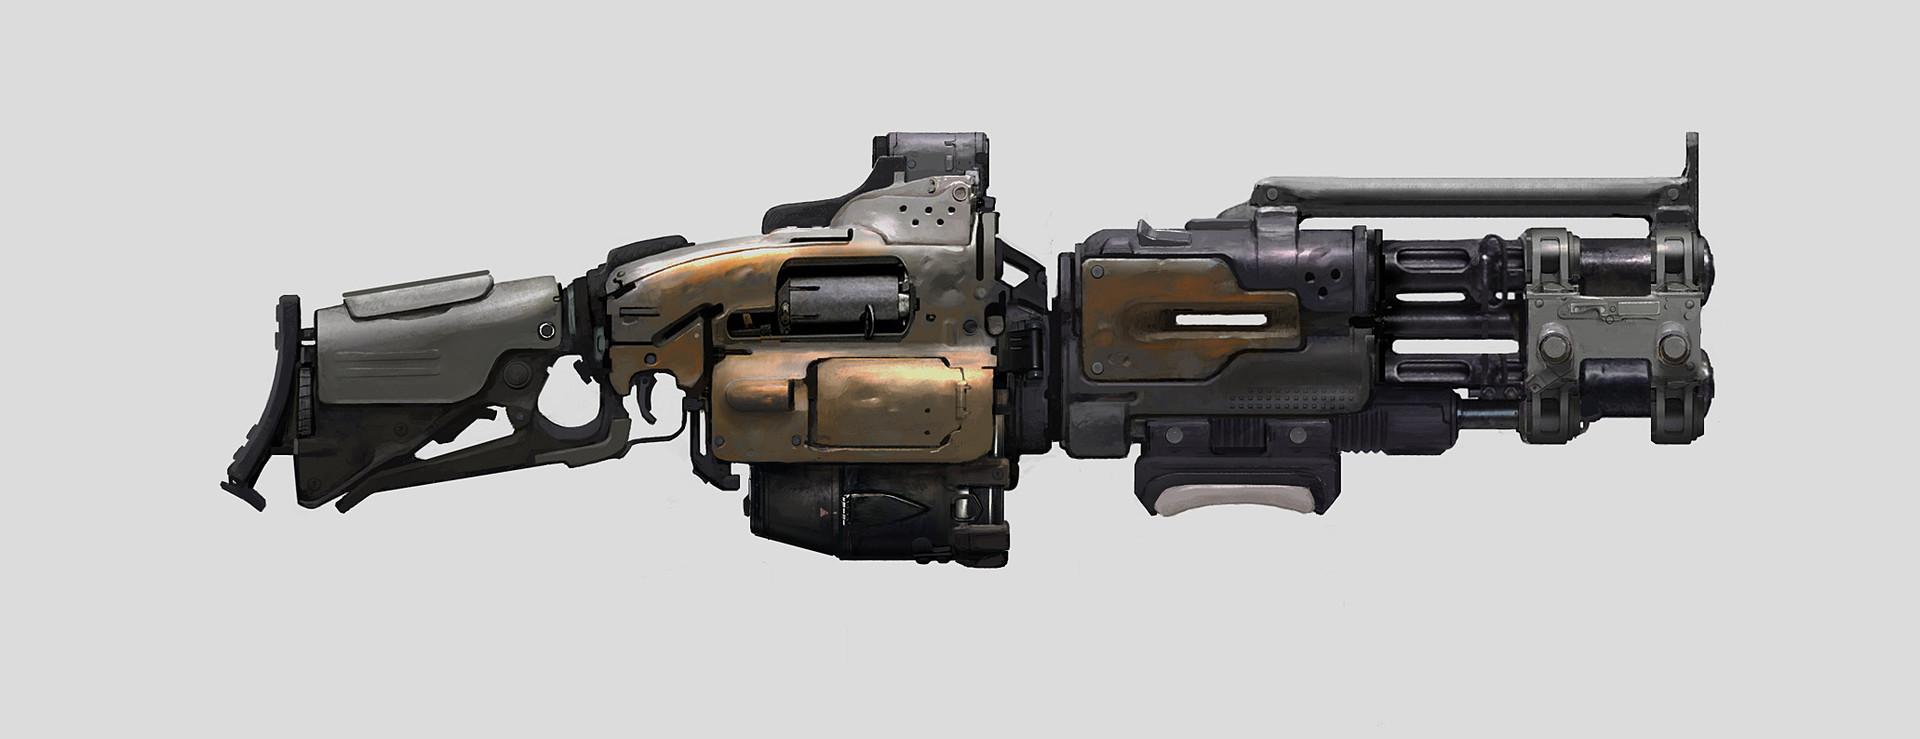 Tipa  graphic slc shotgun concept 01 01 color